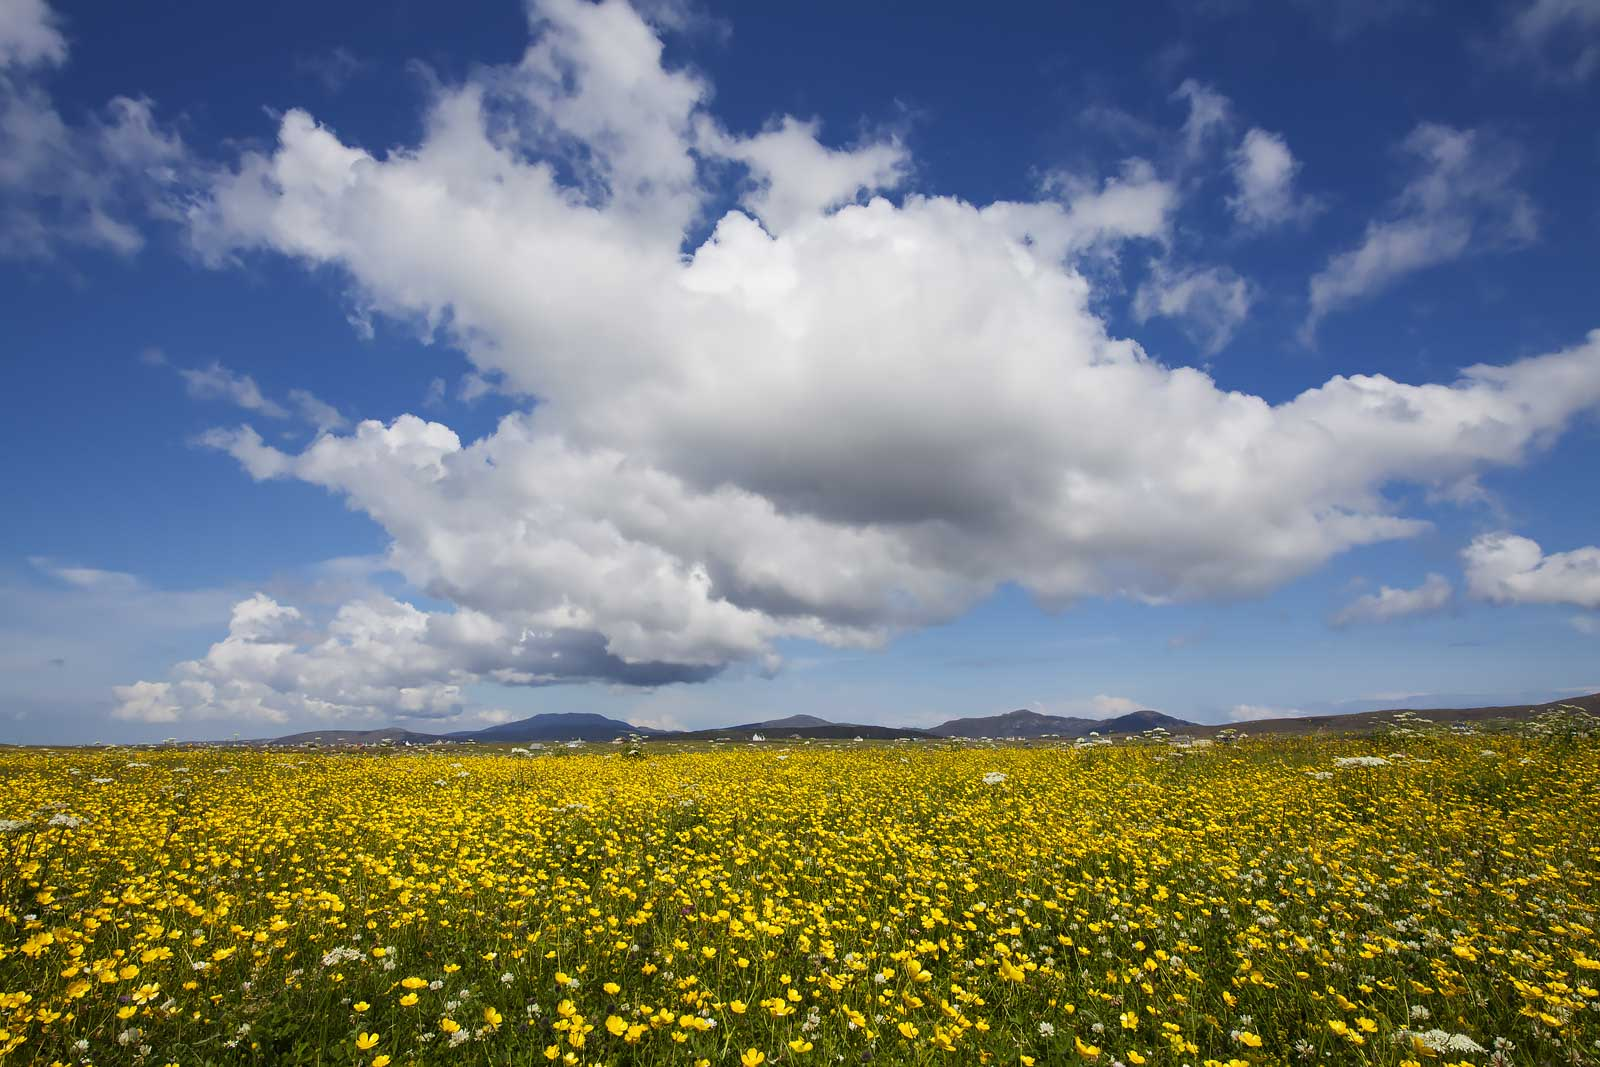 landscape summer season